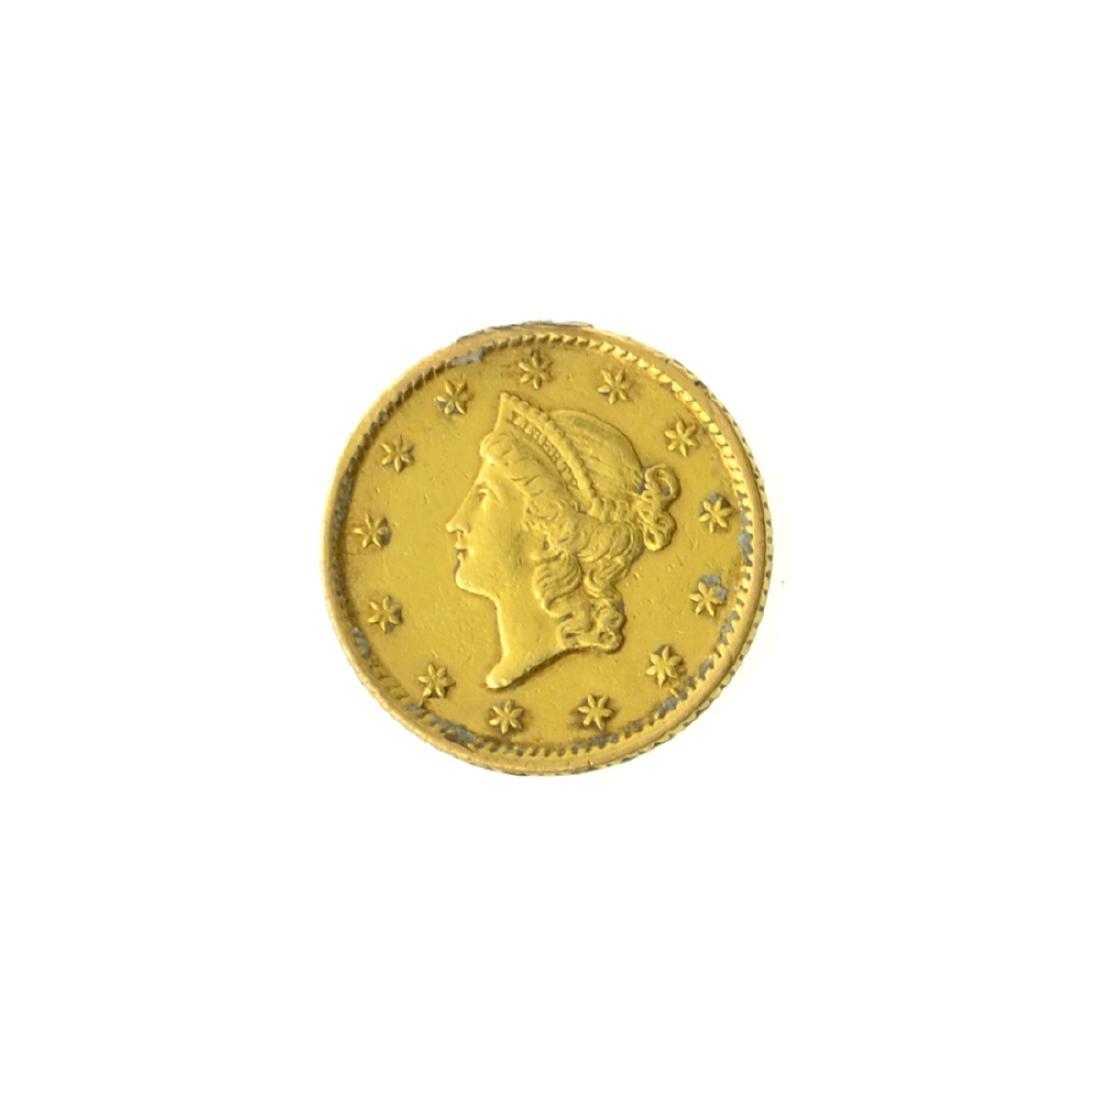 *1854 $1 U.S. Liberty Head Gold Coin (JG-MRT)